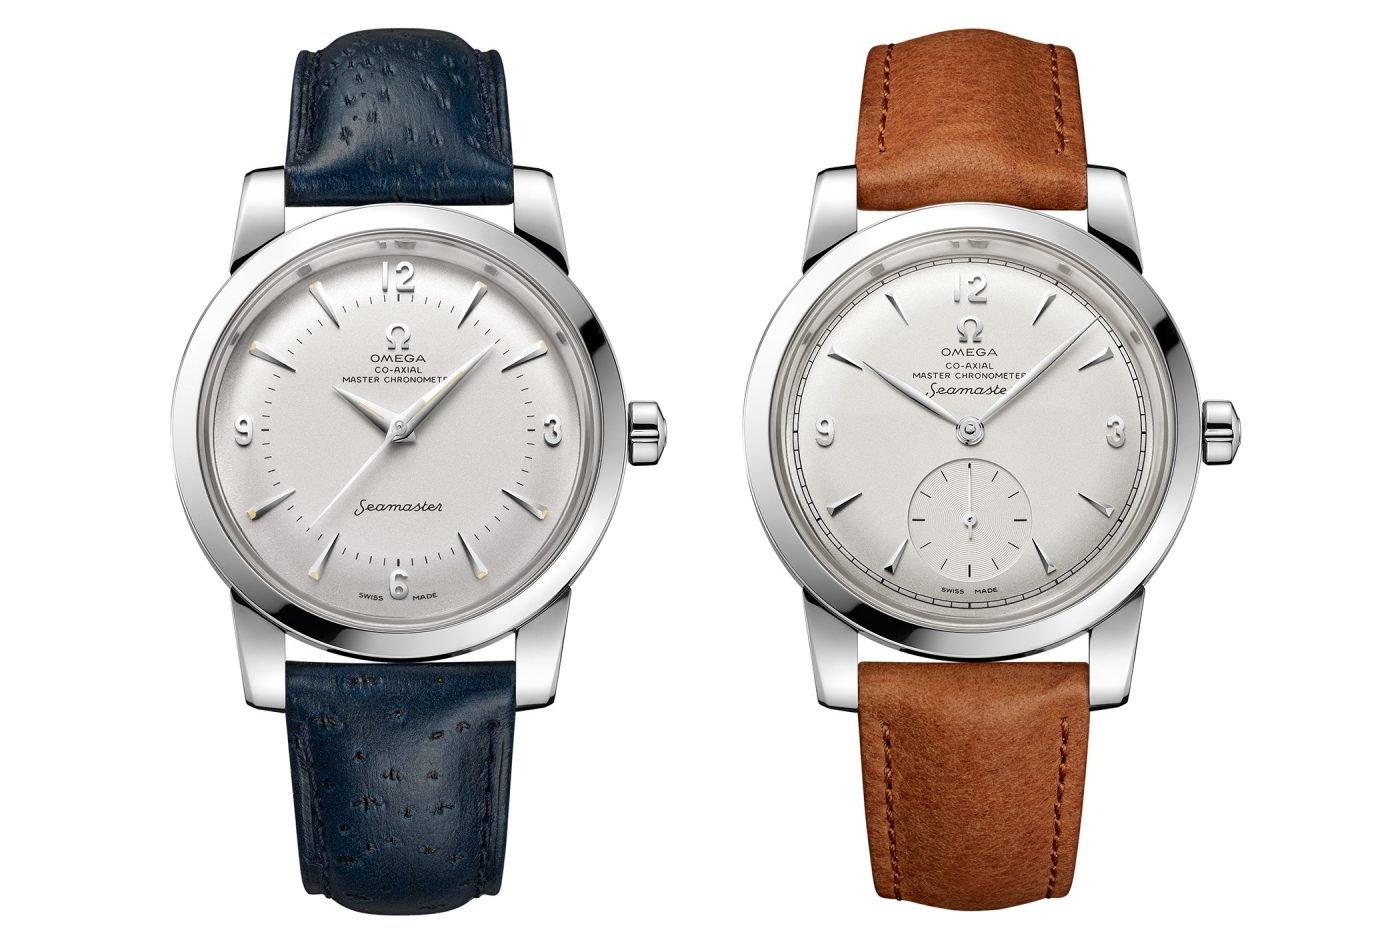 Omega Seamaster 1948 Limited Editions – zegarki na 70-lecie flagowej kolekcji – Basel 2018 [cena]